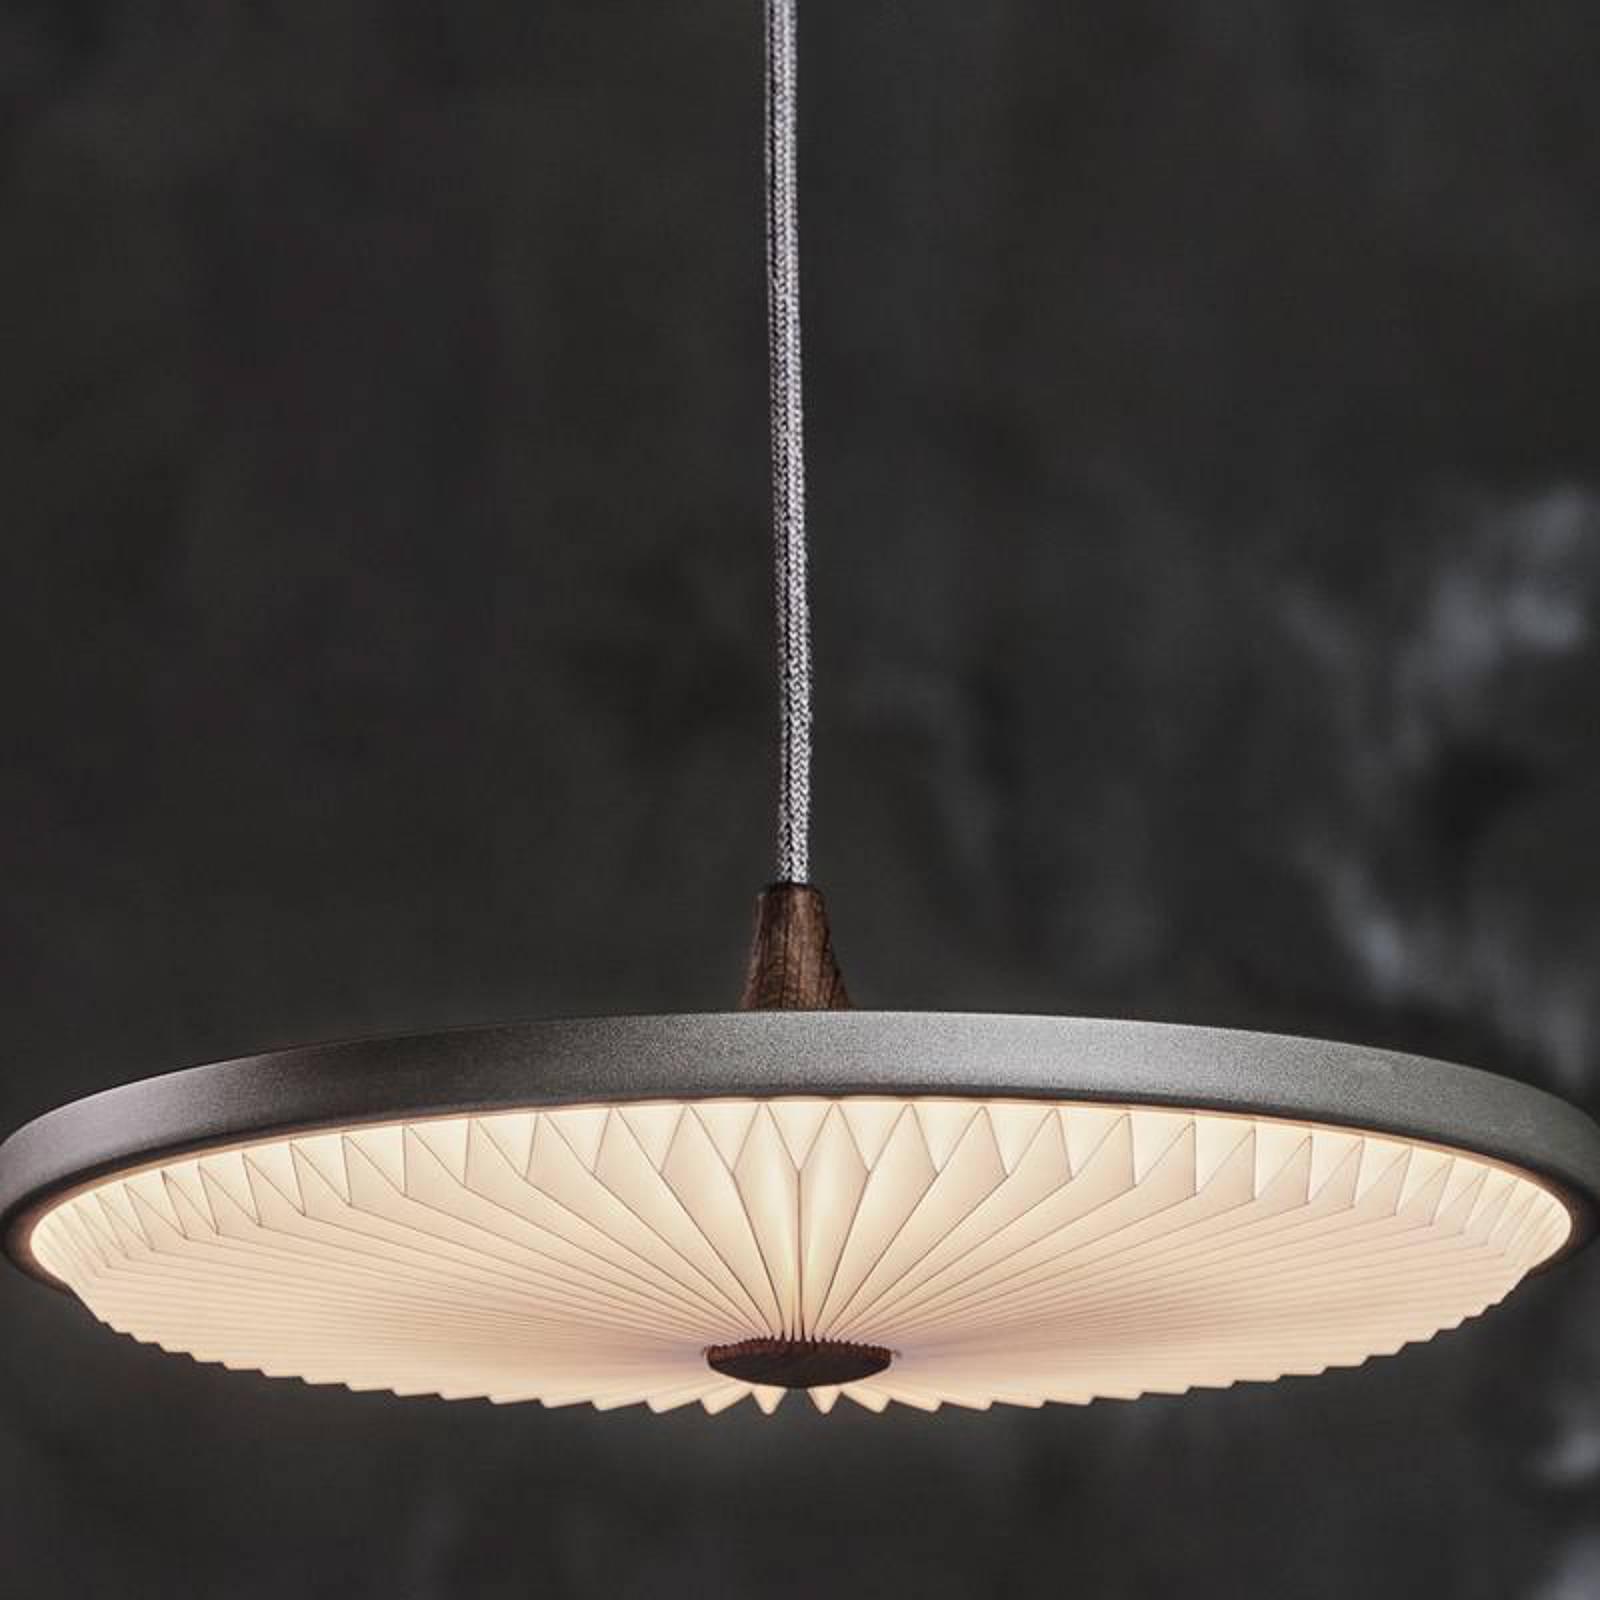 LE KLINT Soleil hanglamp donkergrijs Ø35cm dimbaar